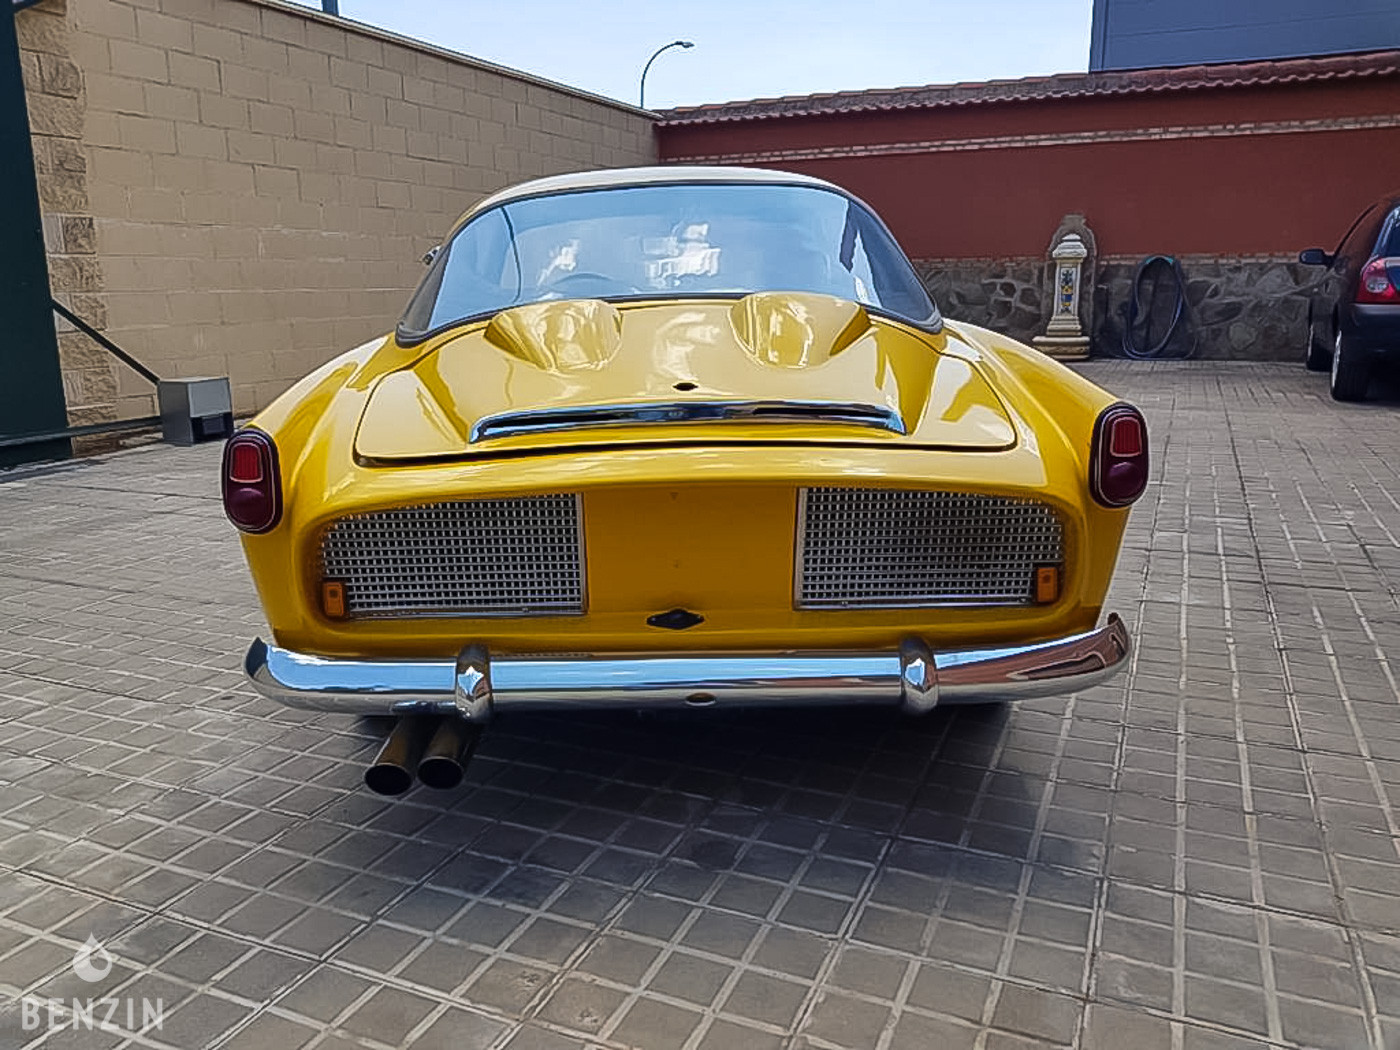 Alpine A108 berlinette 1966 benzin fr img_6013d0fedb59e